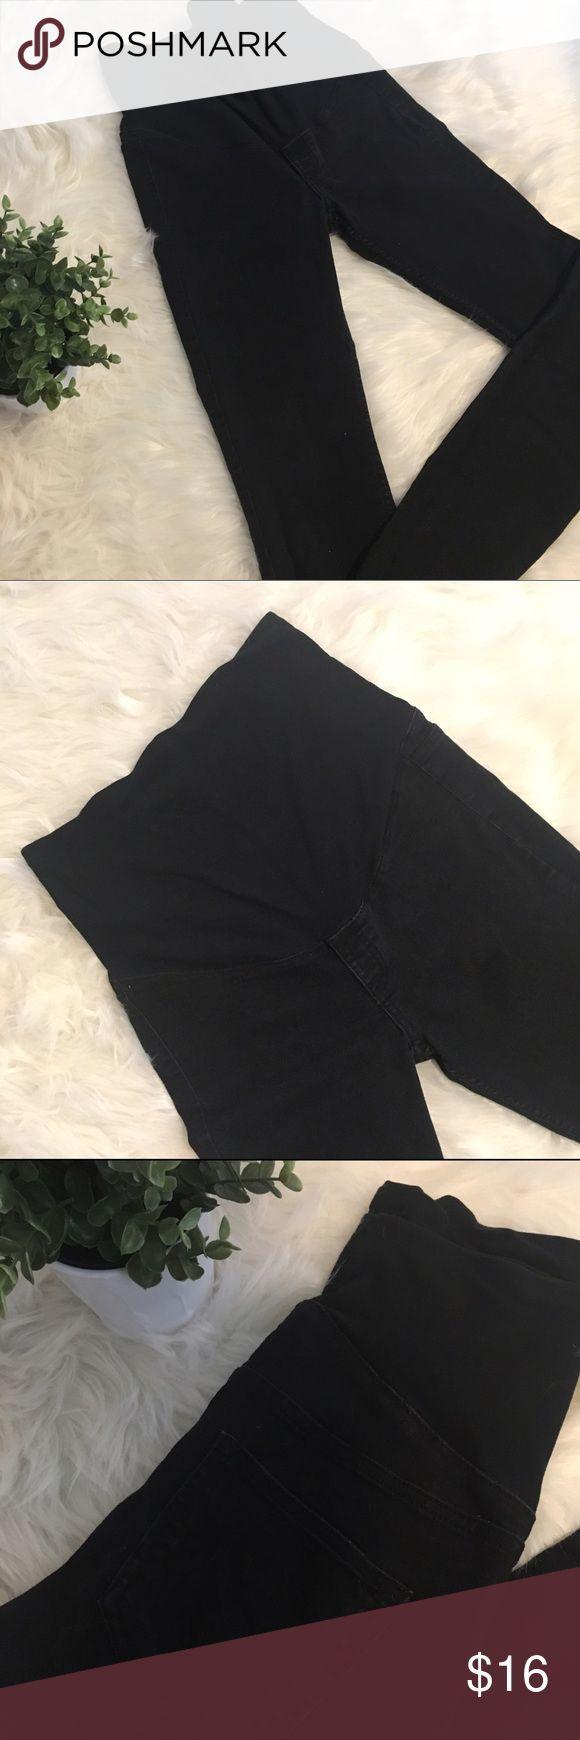 H&M MAMA Black Maternity Skinny Jeans H&M MAMA Black Maternity Skinny Jeans in great condition. Extremely comfortable. Pet & Smoke Free Home. H&M Jeans Skinny